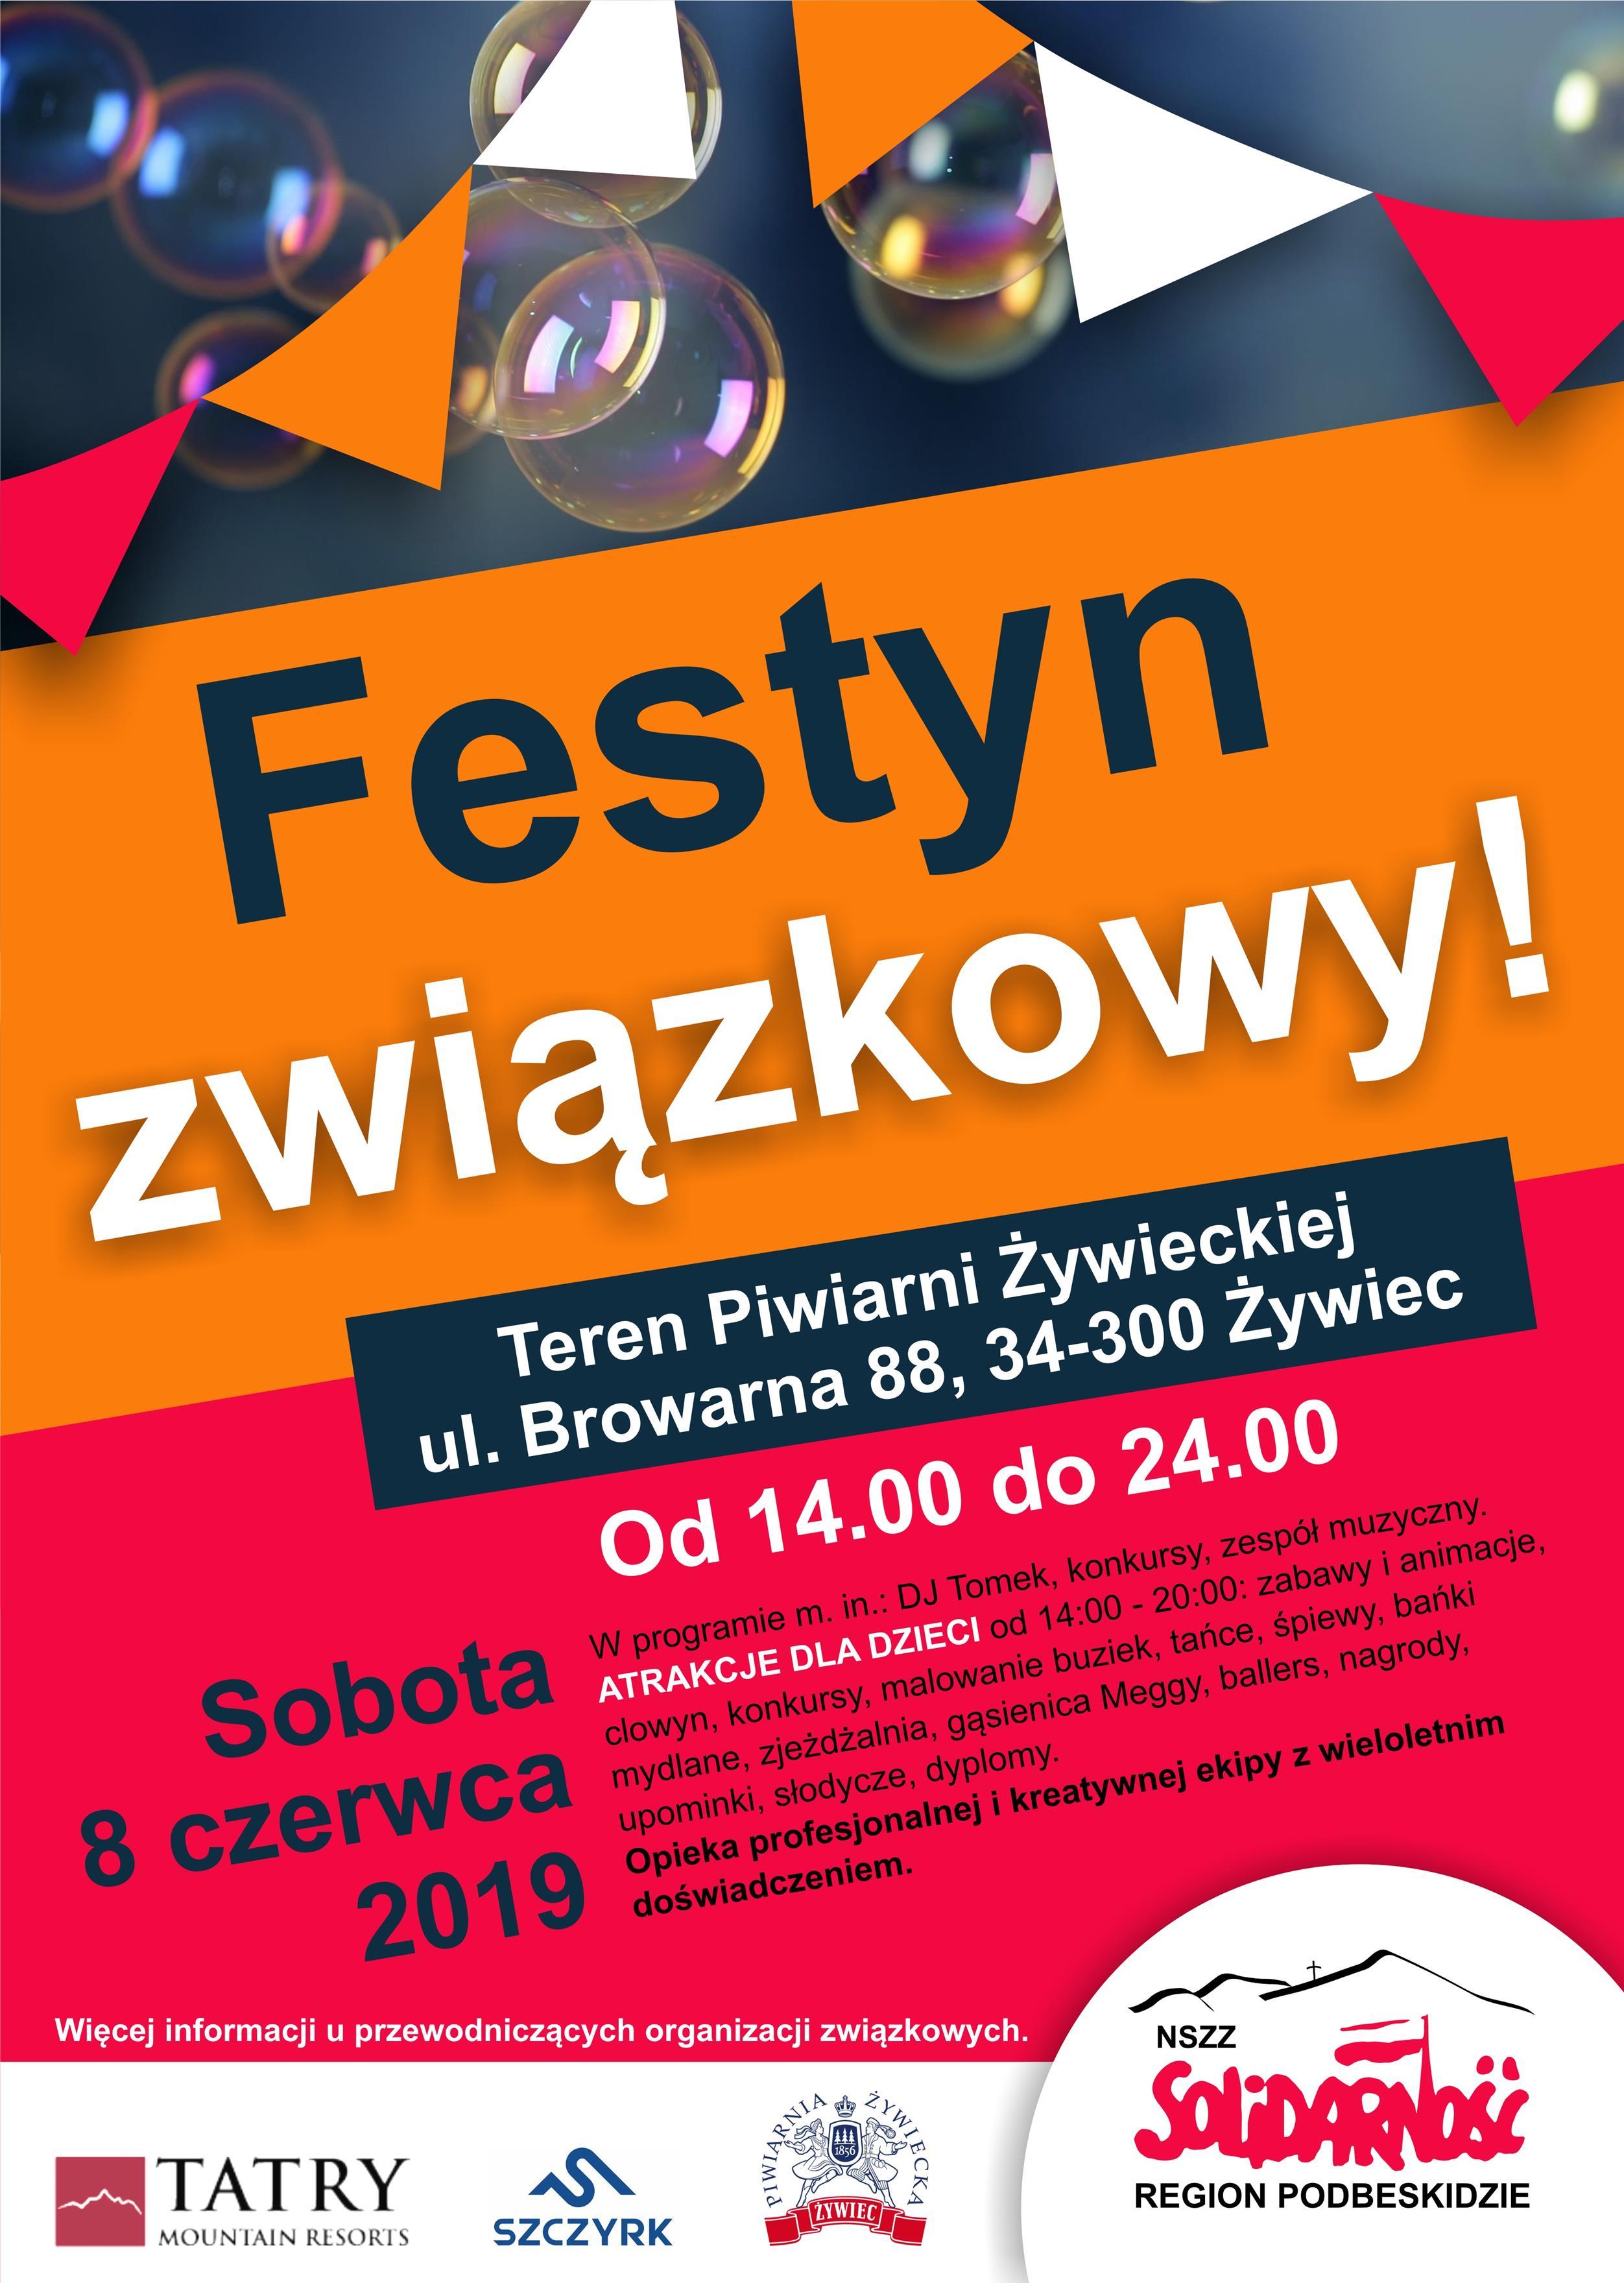 Plakat - Festyn związkowy 2019 (Copy)